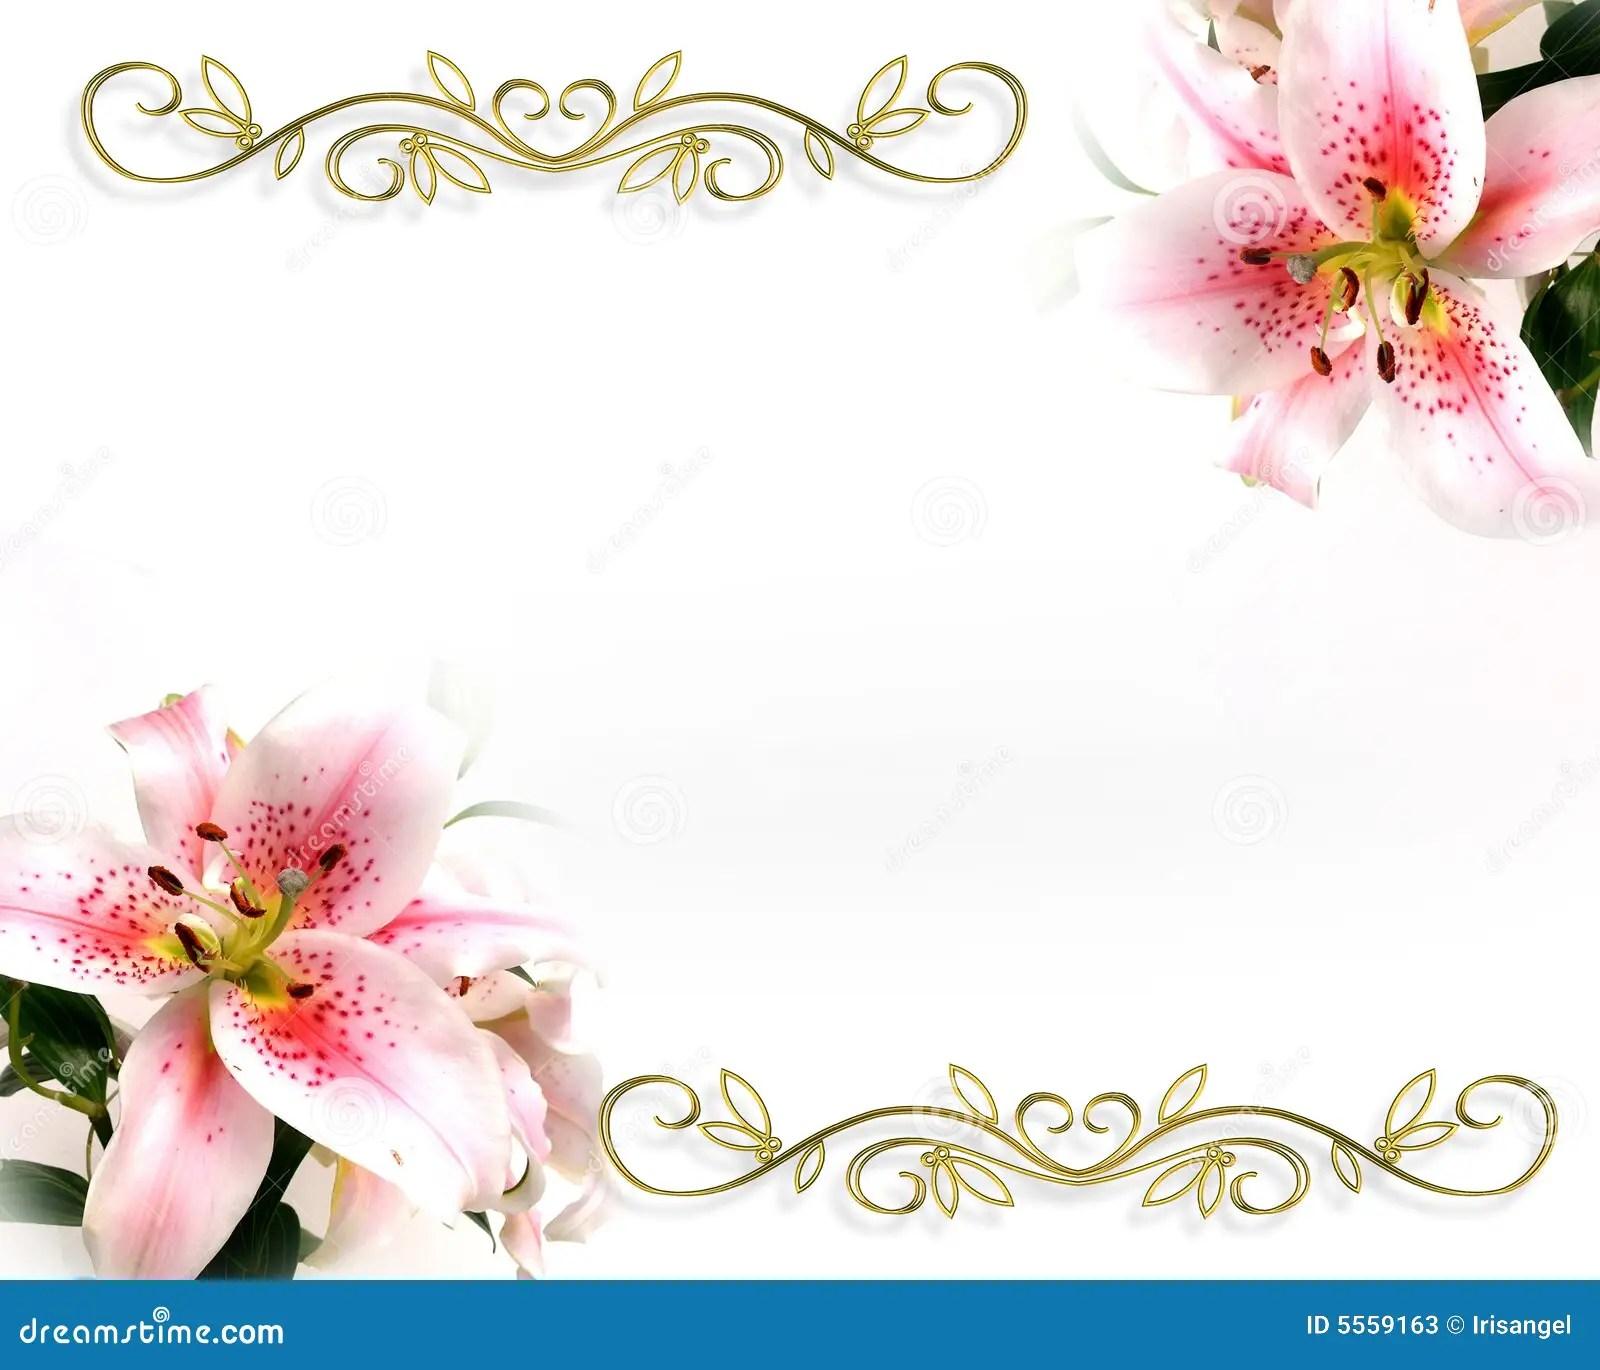 Lily Floral Invitation Romantic Design Stock Photos  Image 5559163